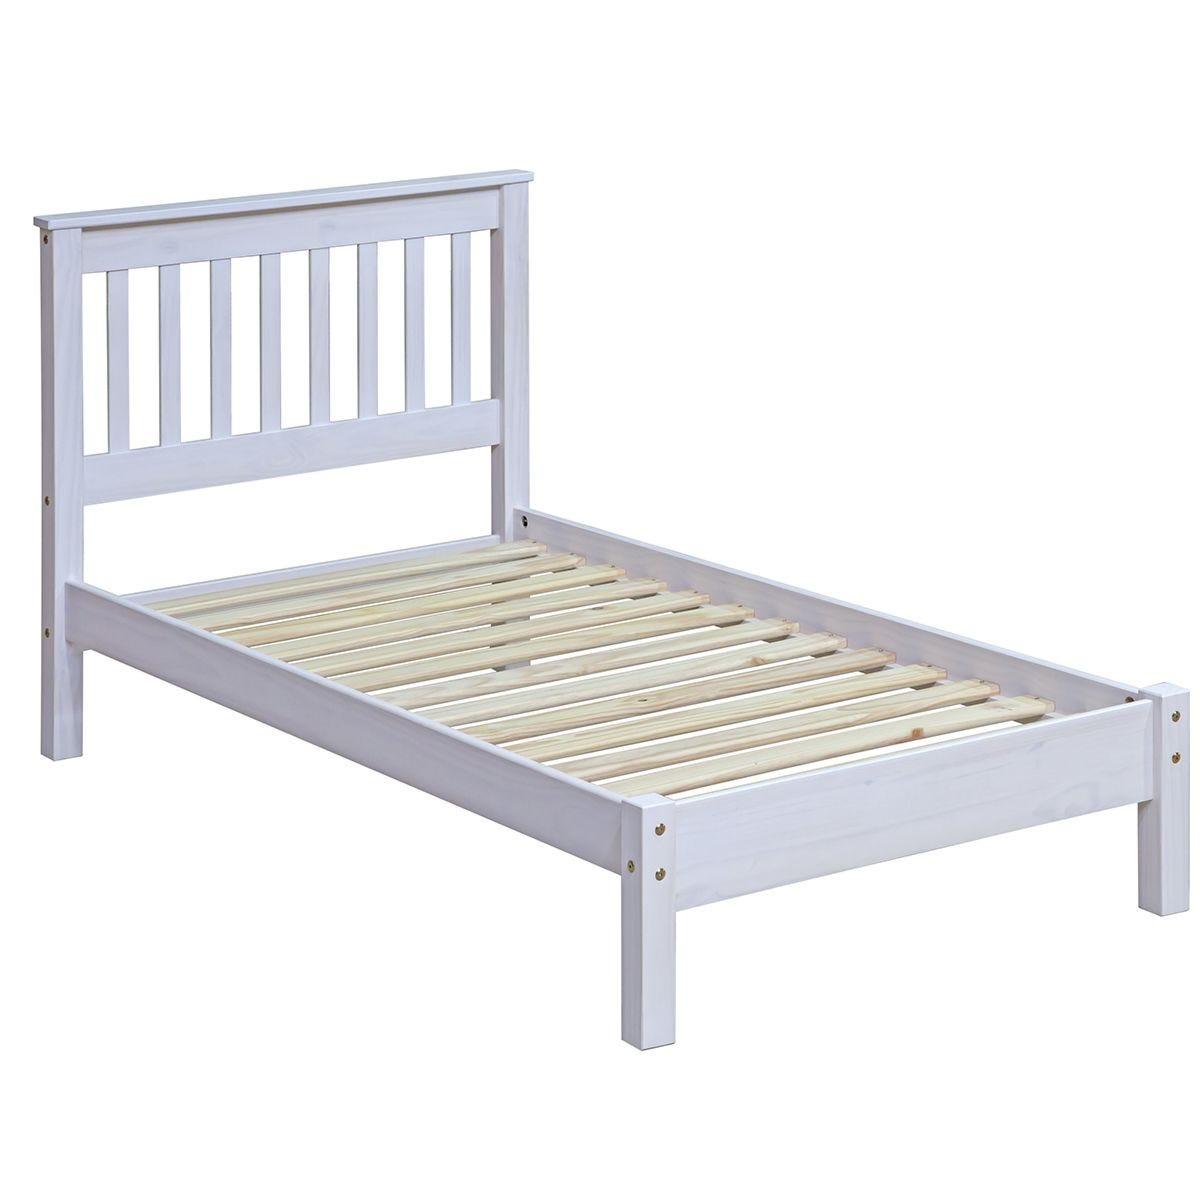 Halea Pine 3' Single Bed - White